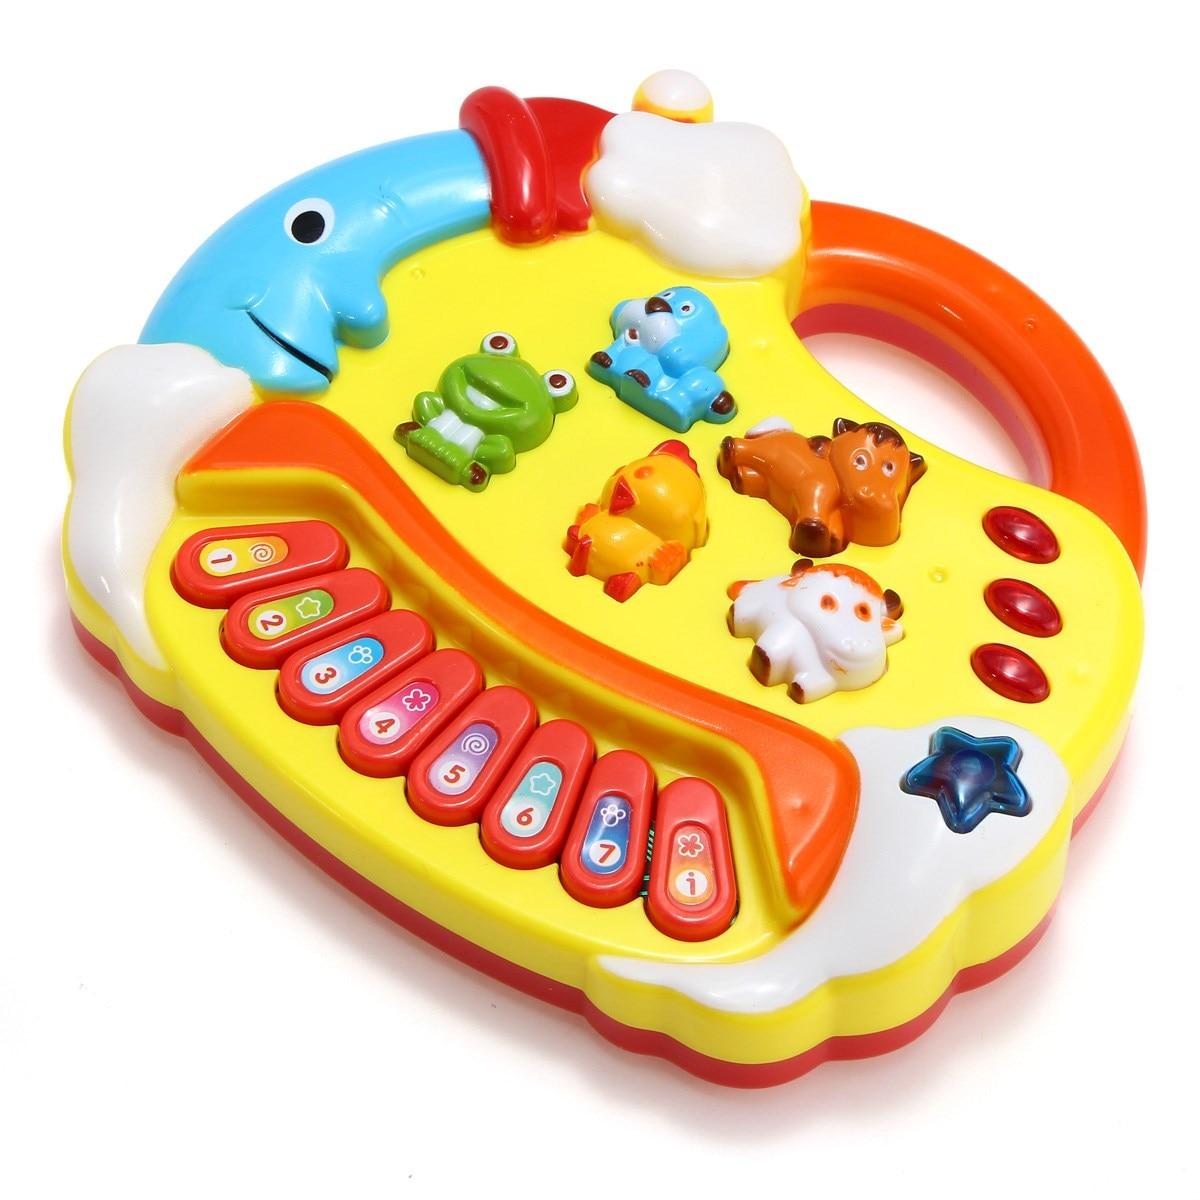 Funny-Lovely-Baby-Children-Kids-Musical-Educational-Animal-Farm-Piano-Toys-Developmental-Music-Toy-For-Children-2